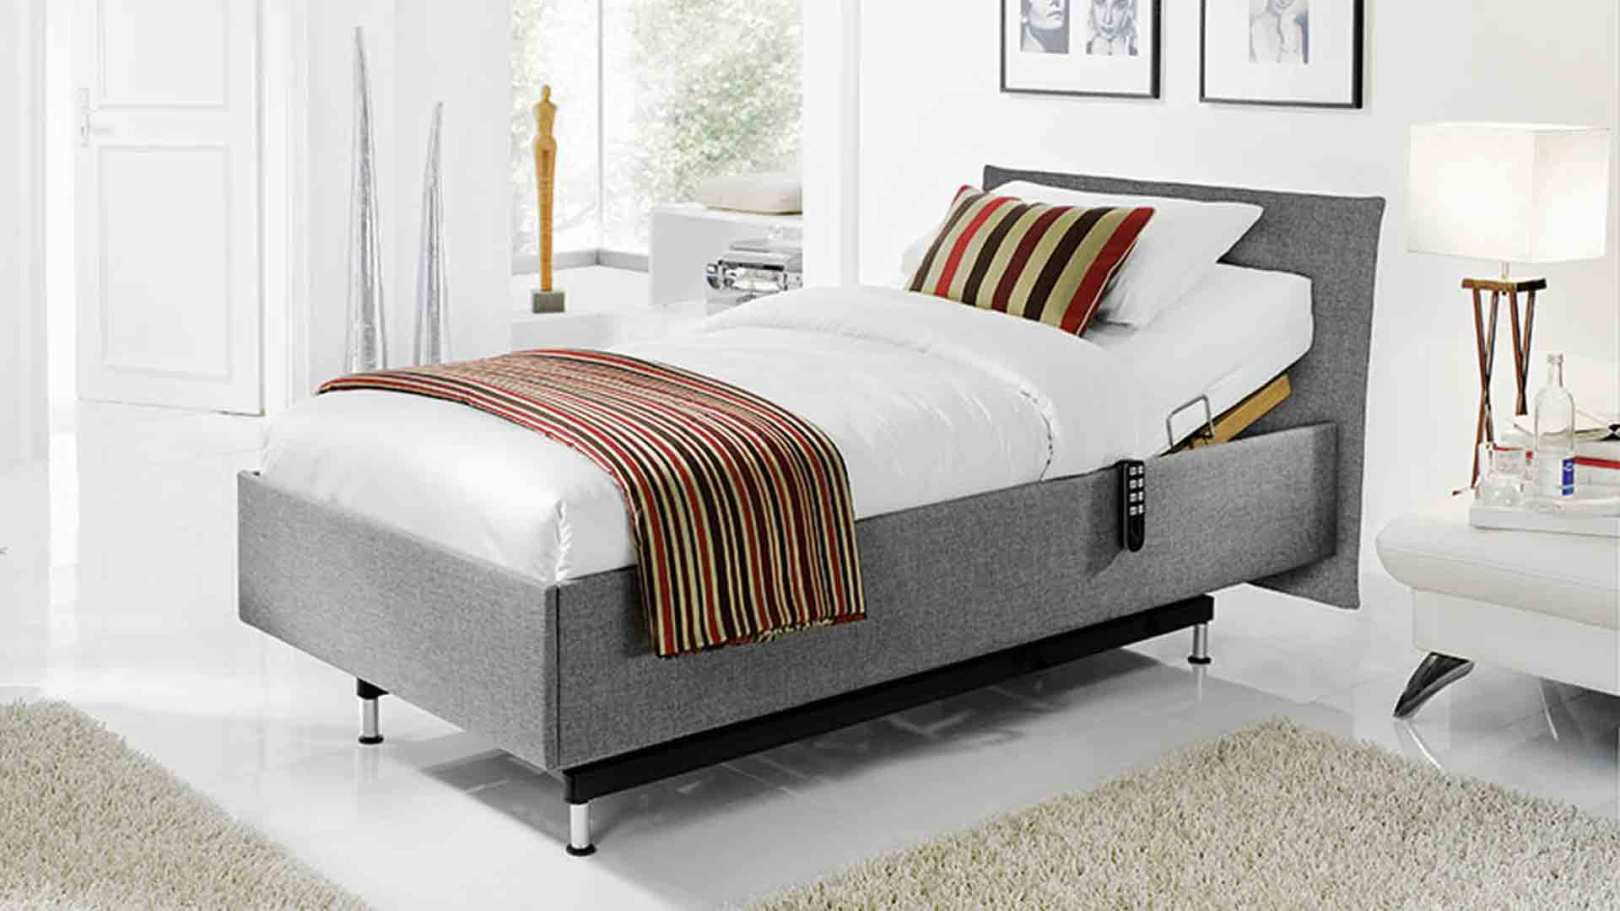 Betten Hoenscheidt Duesseldorf Pflegebetten Seniorenbetten Komfortbetten